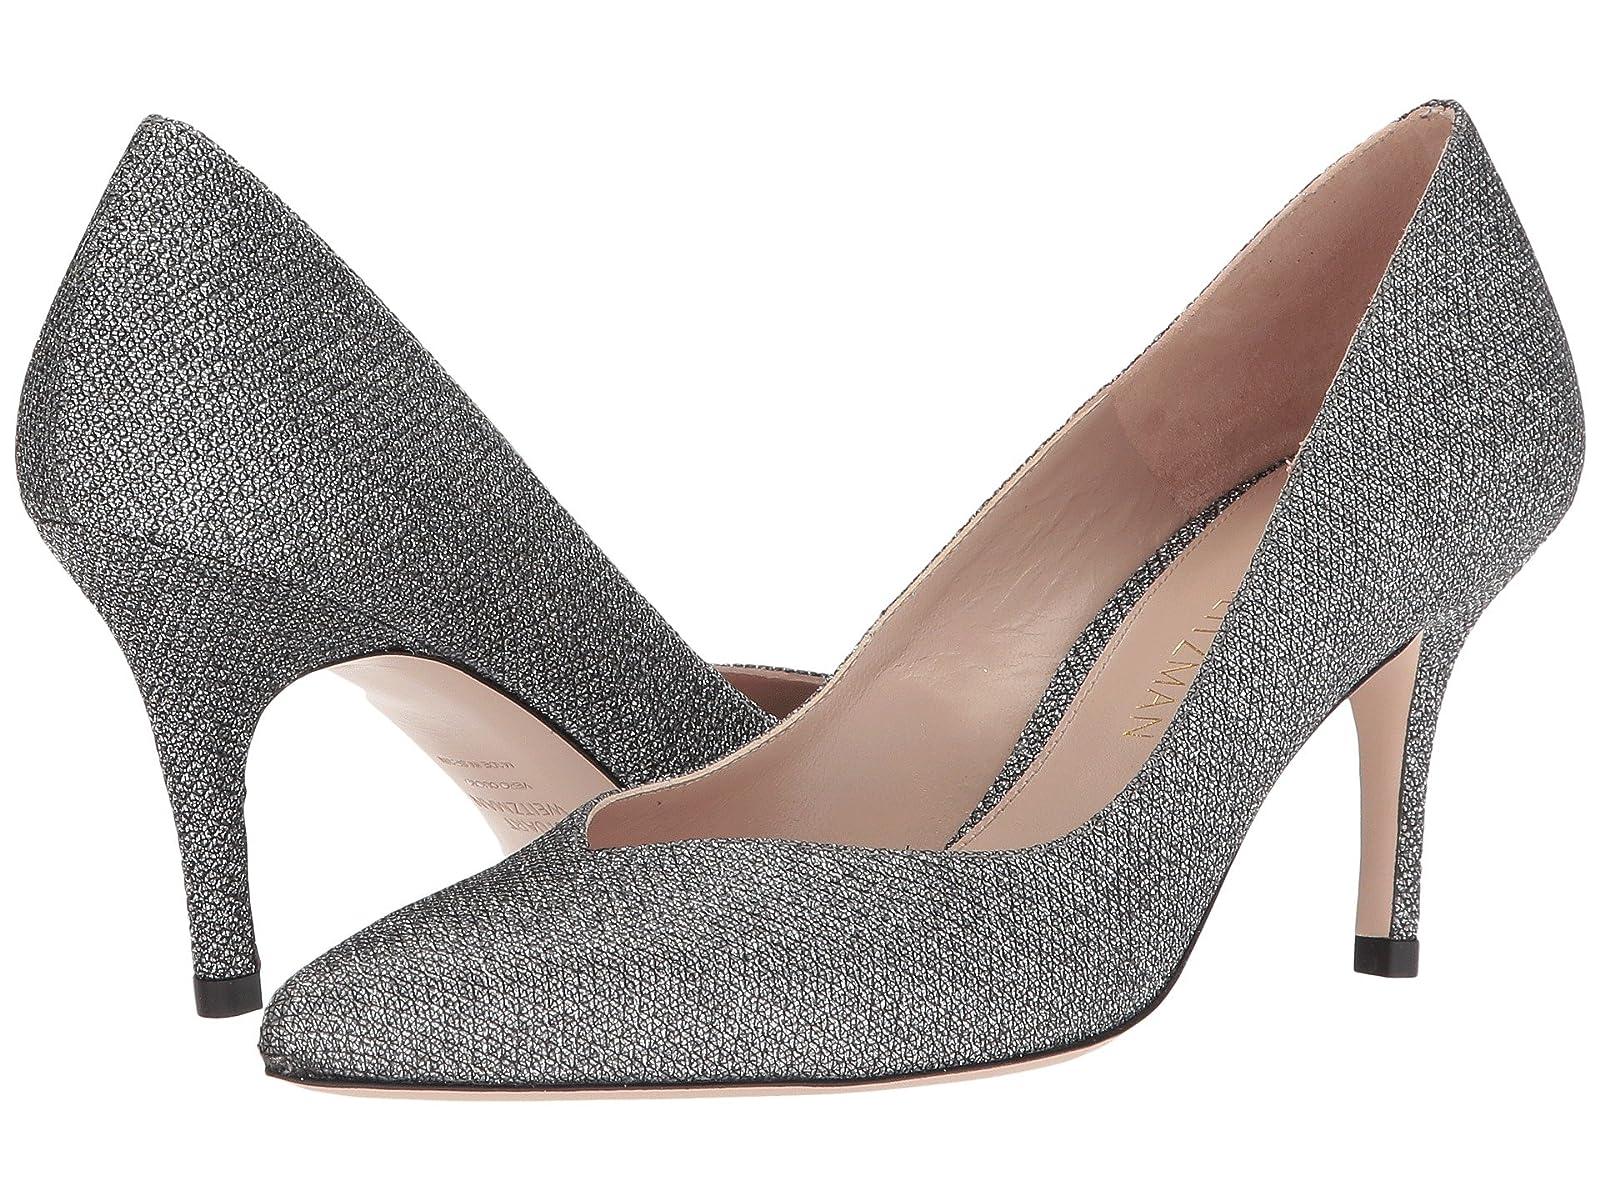 Stuart Weitzman ViceroyCheap and distinctive eye-catching shoes